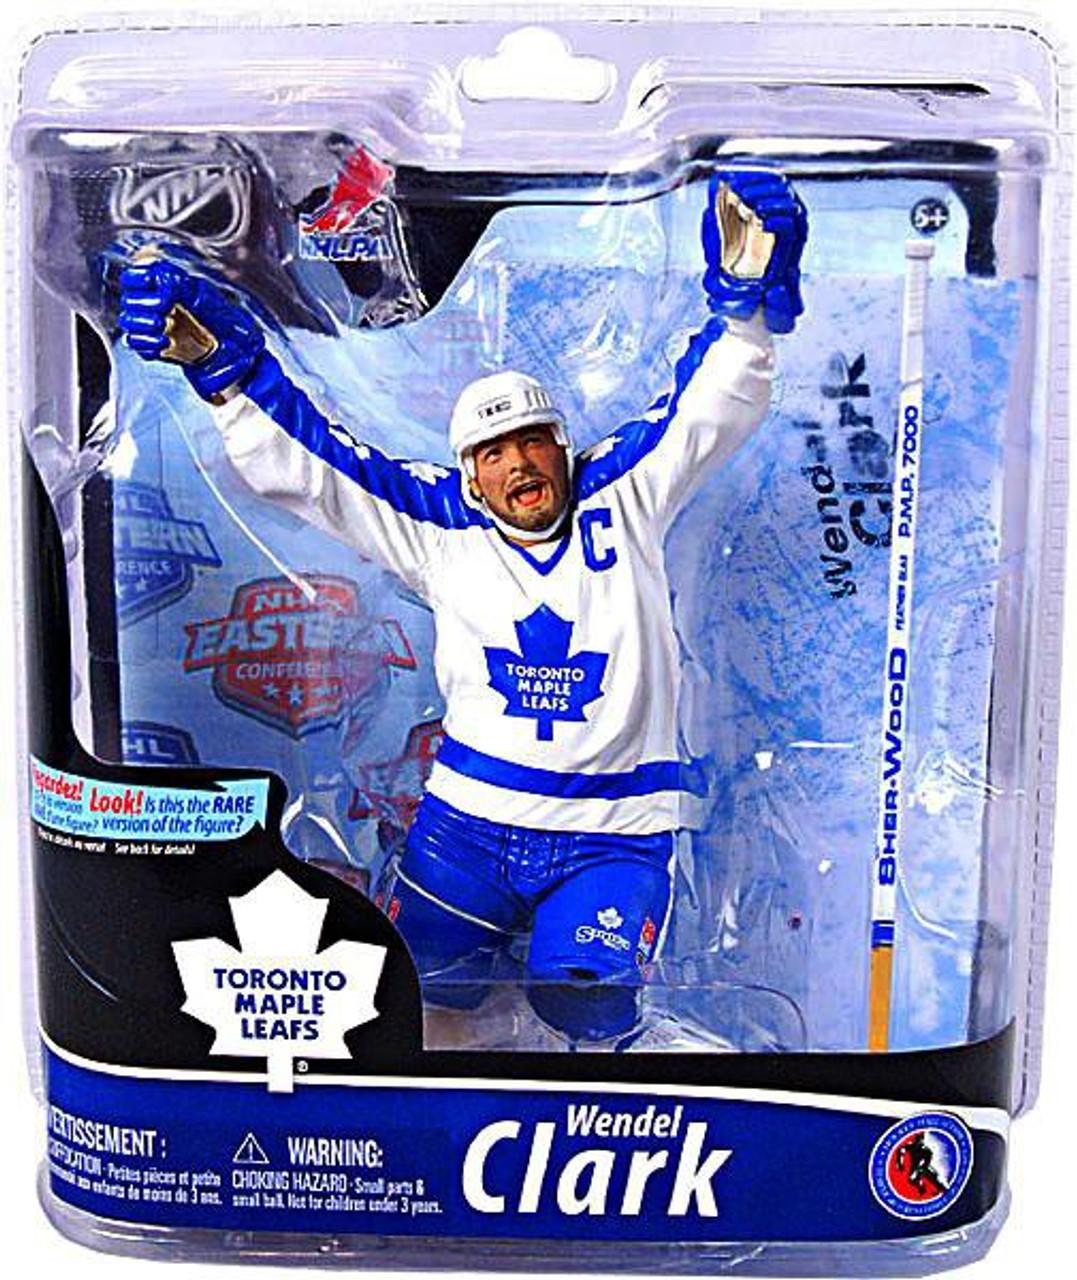 McFarlane Toys NHL Toronto Maple Leafs Sports Picks Series 28 Wendel Clark Action Figure